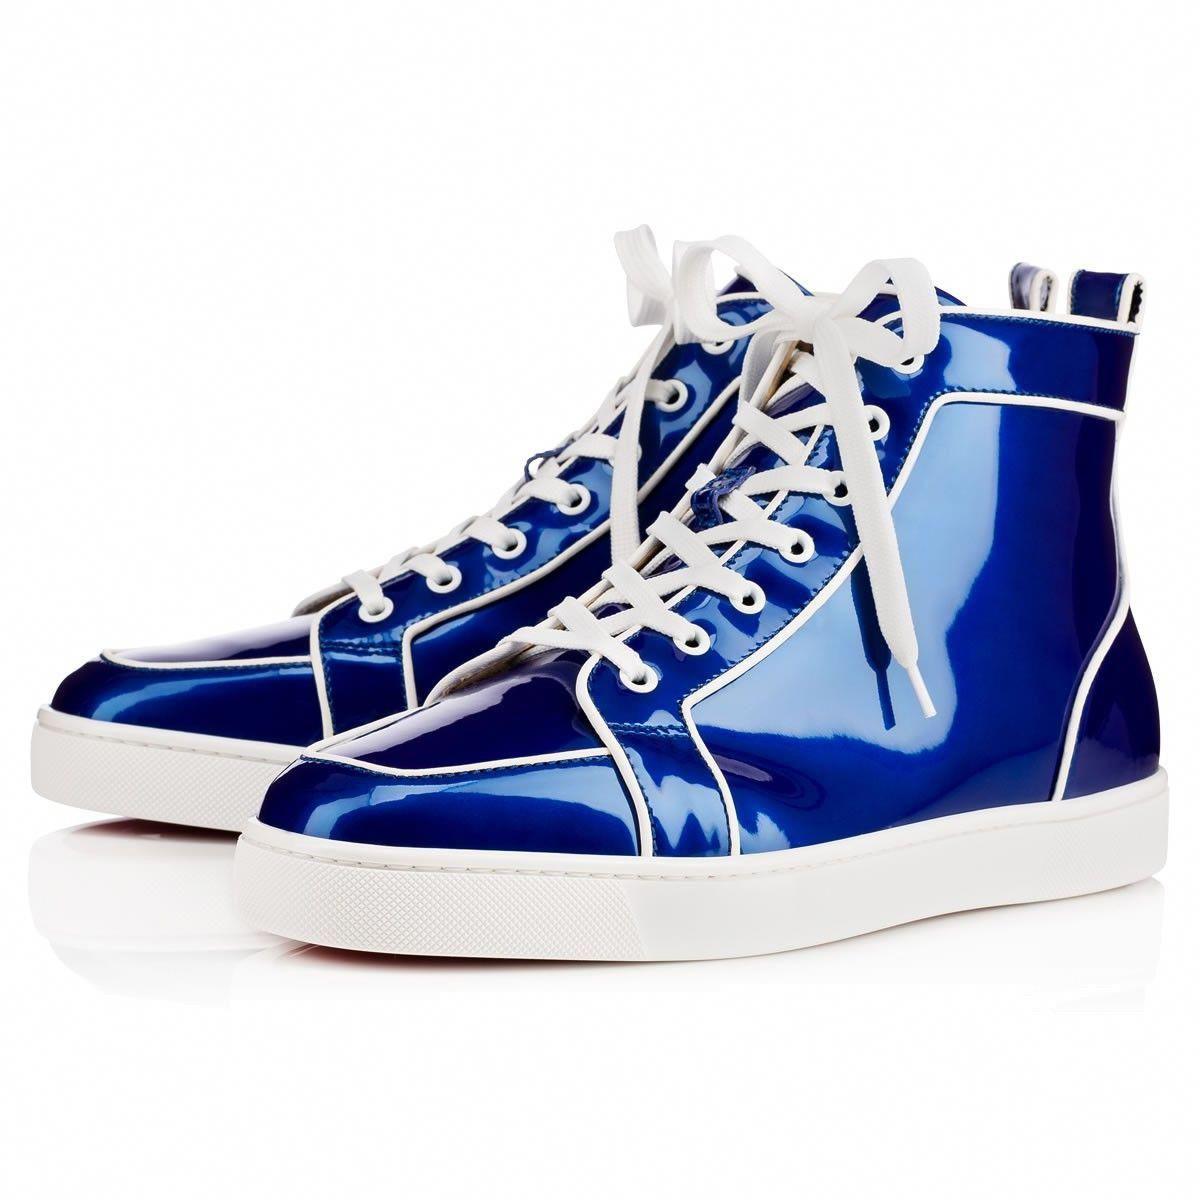 dee9ed7663ad CHRISTIAN LOUBOUTIN Rantus Orlato Men S Flat Blue Latte Glossy Patent - Men  Shoes - Christian Louboutin.  christianlouboutin  shoes